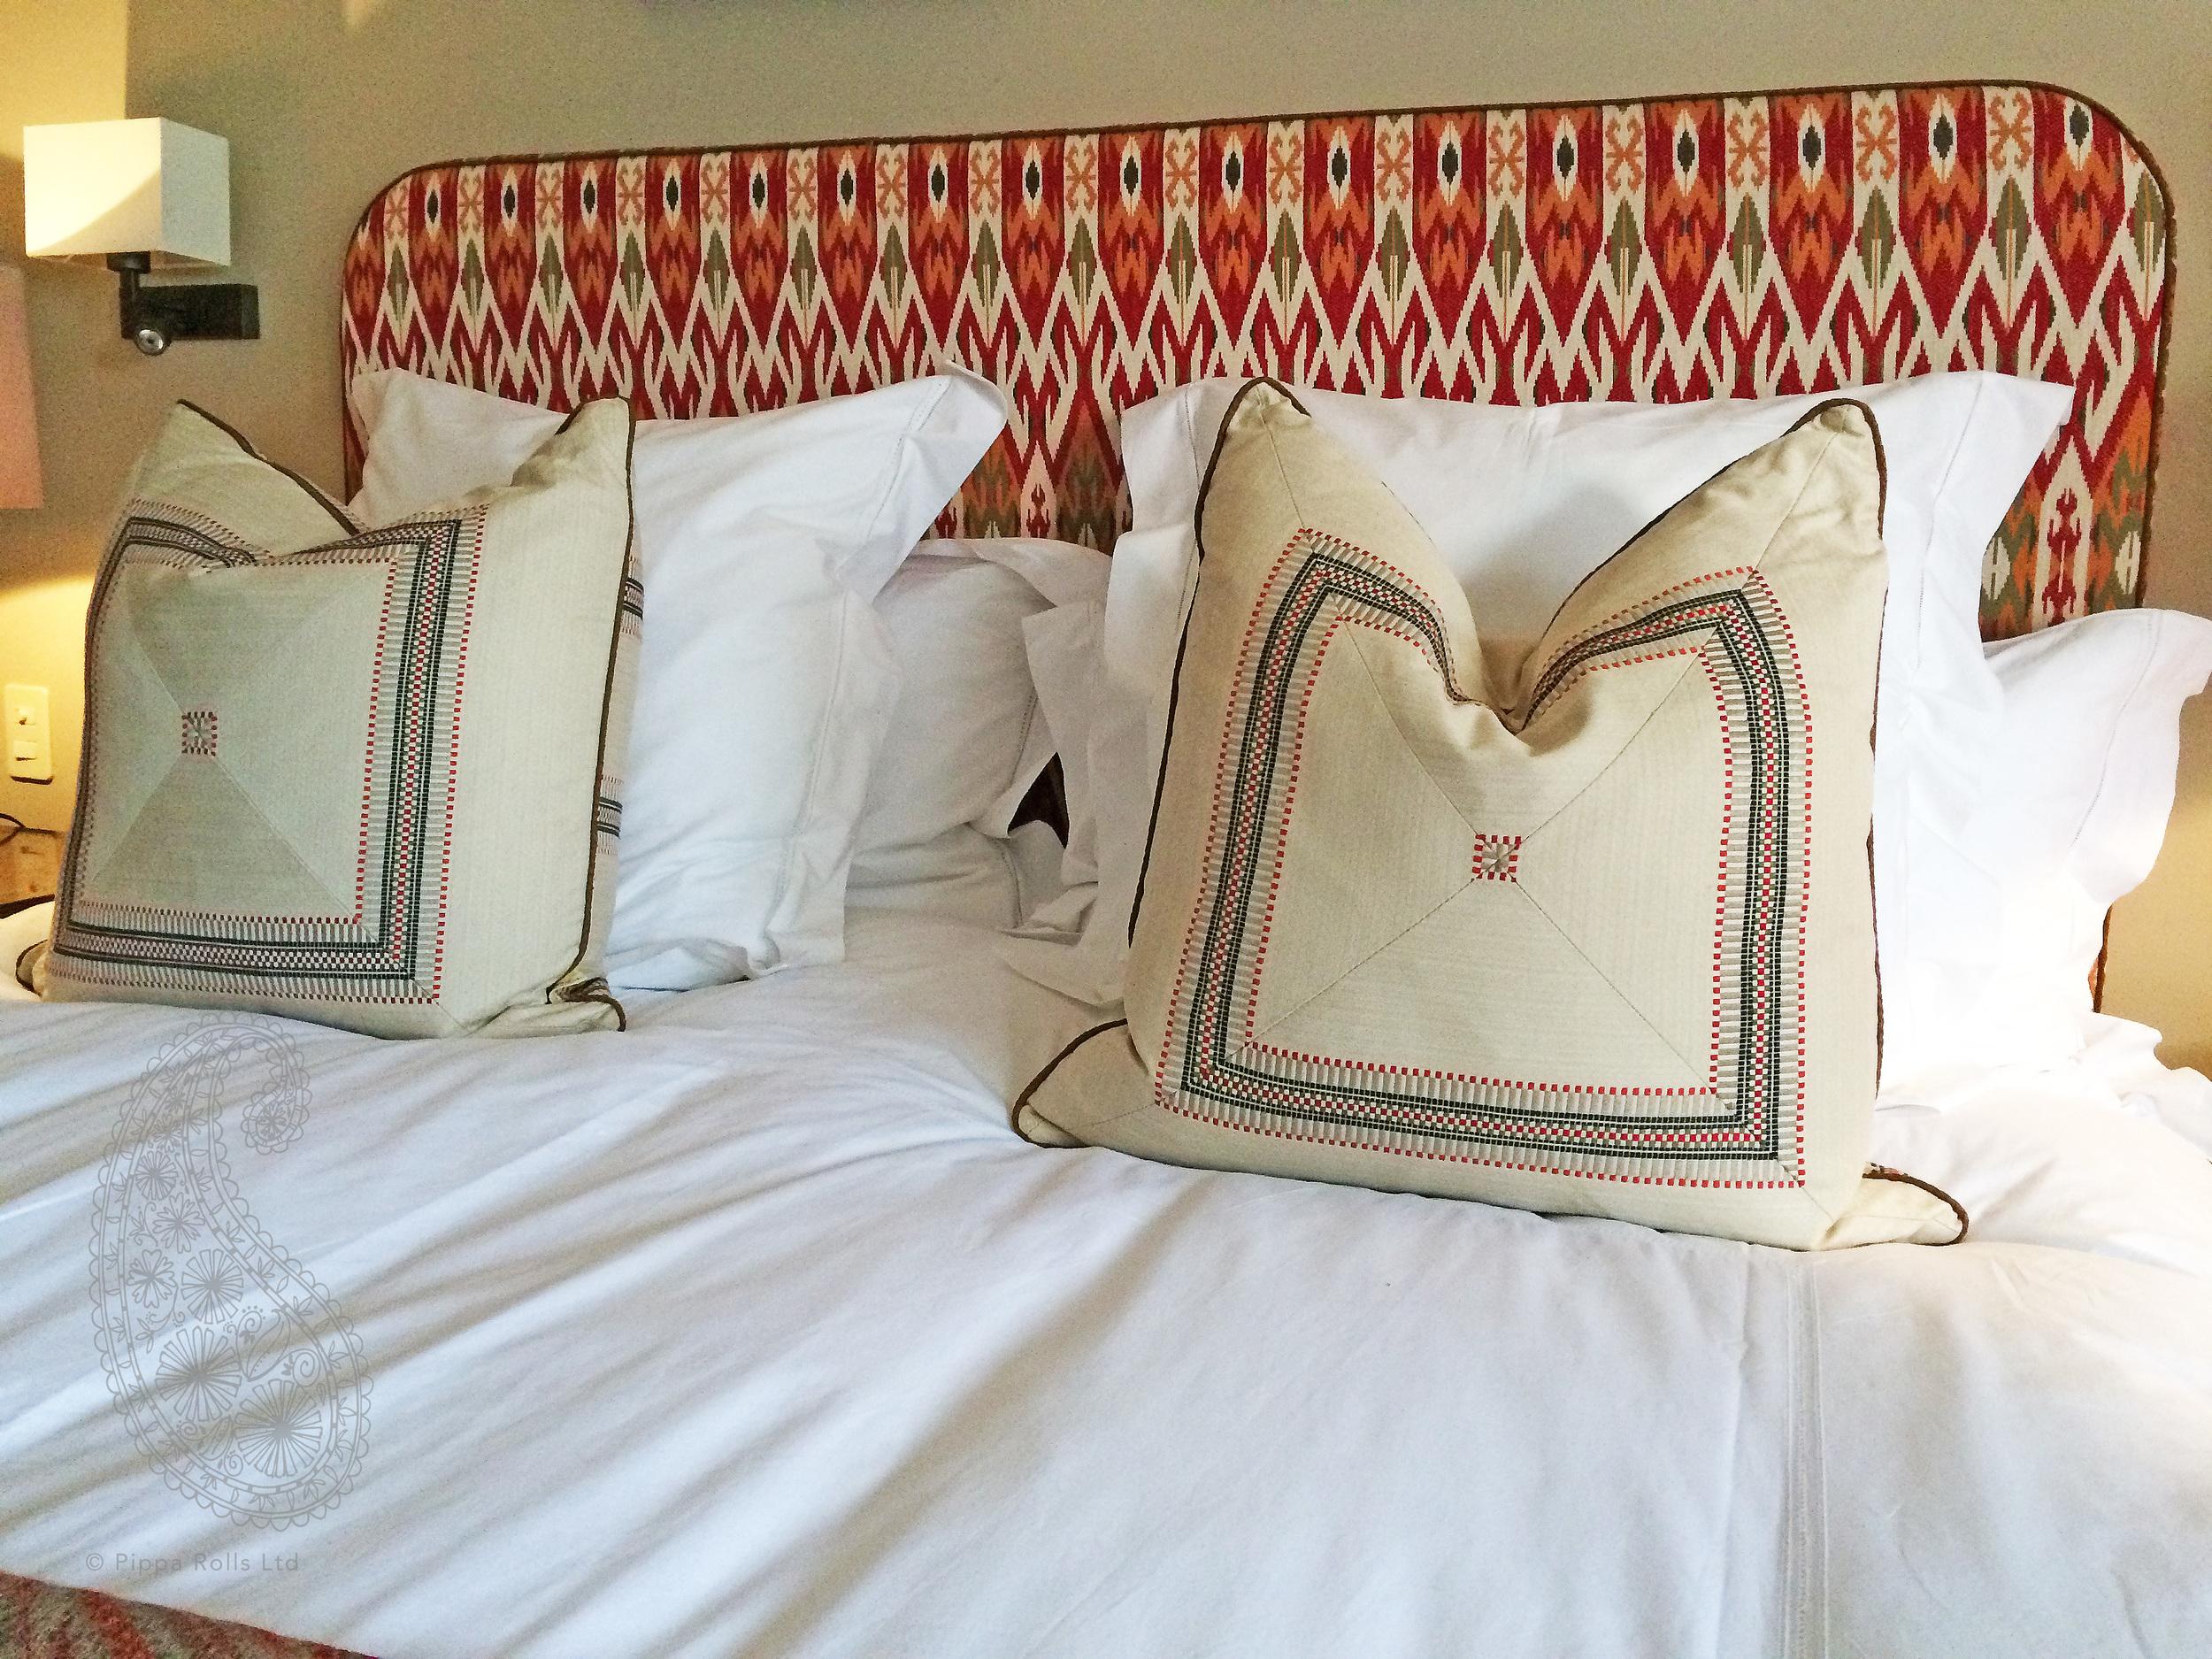 Infinity cushions by Pippa Rolls Limited jpeg.jpg